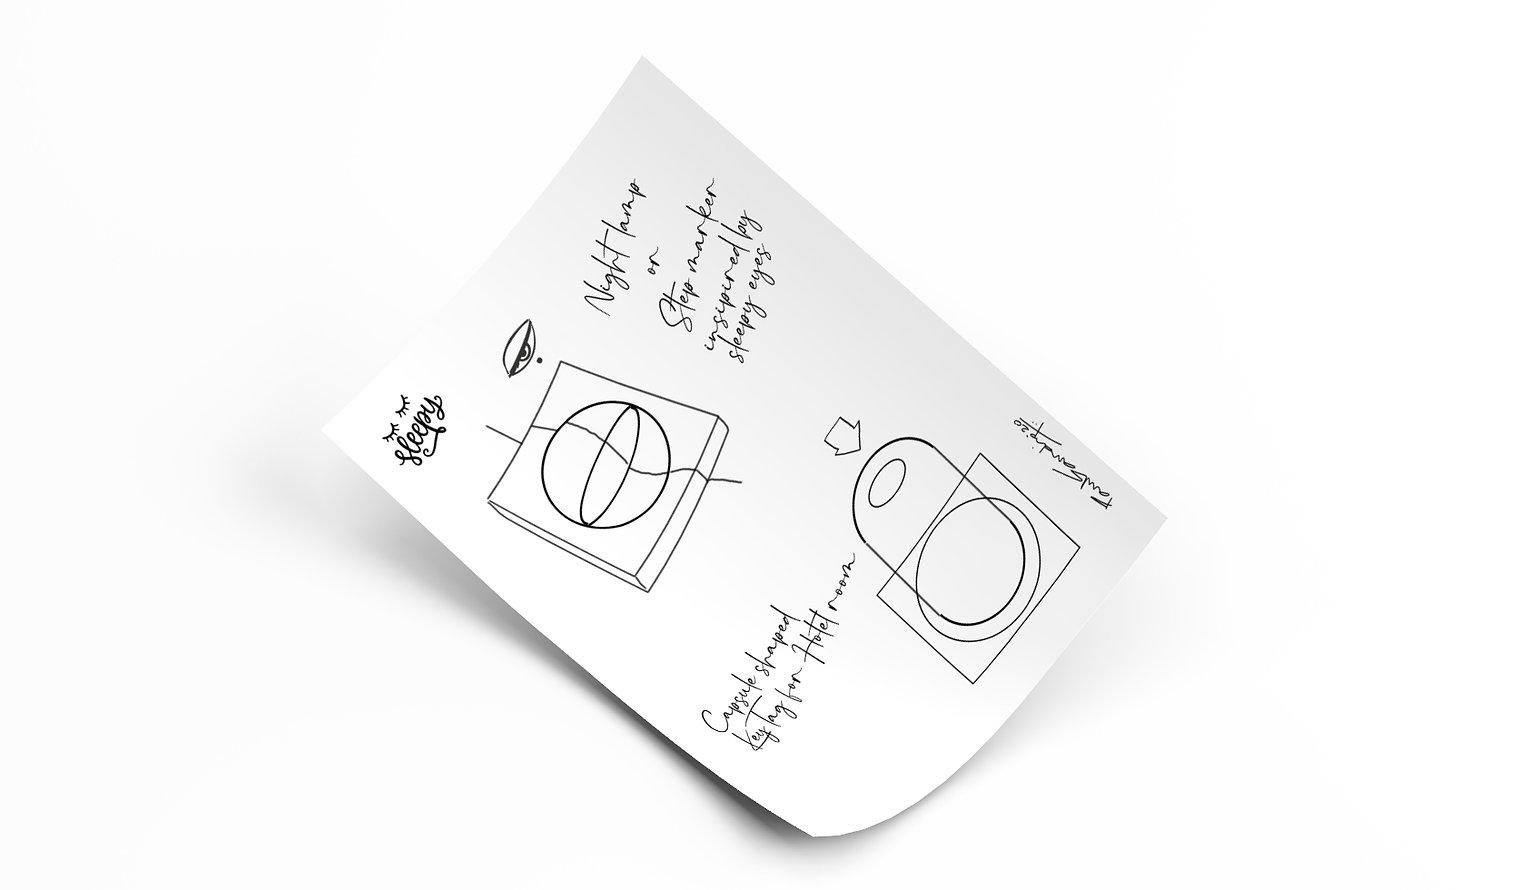 Four x modular accessories_idea sketch b